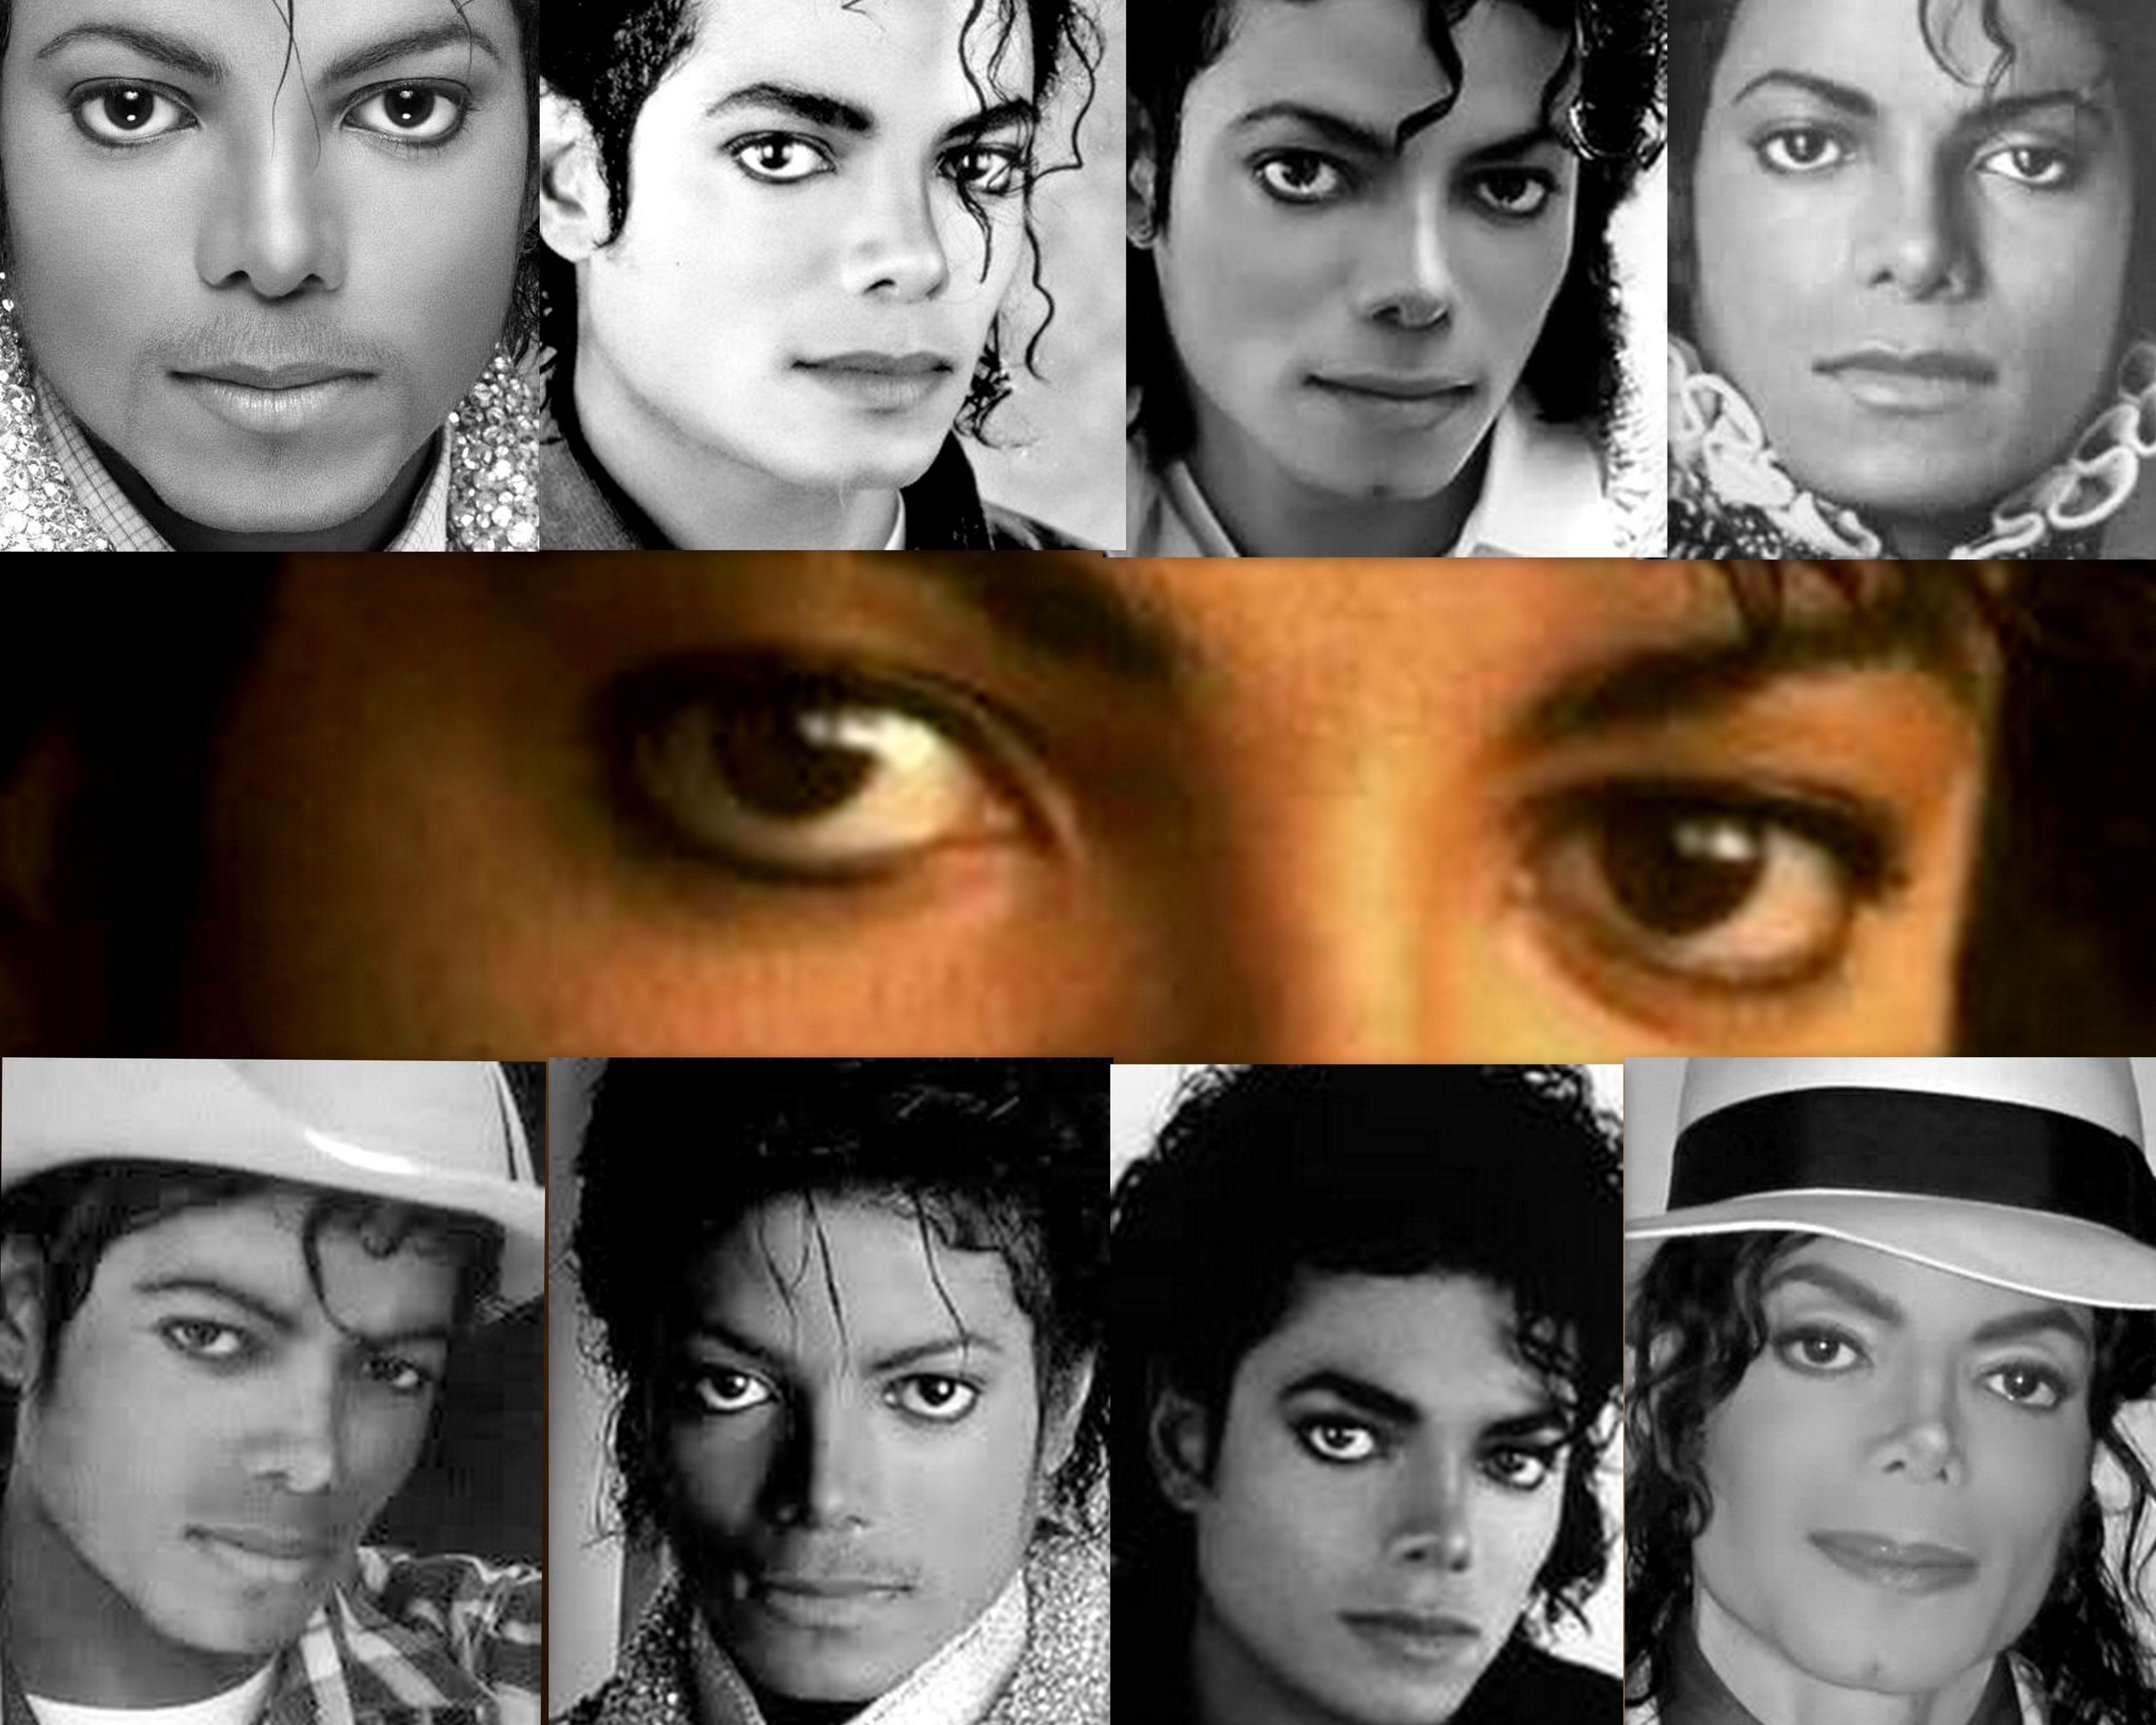 those eyes, need i say more?